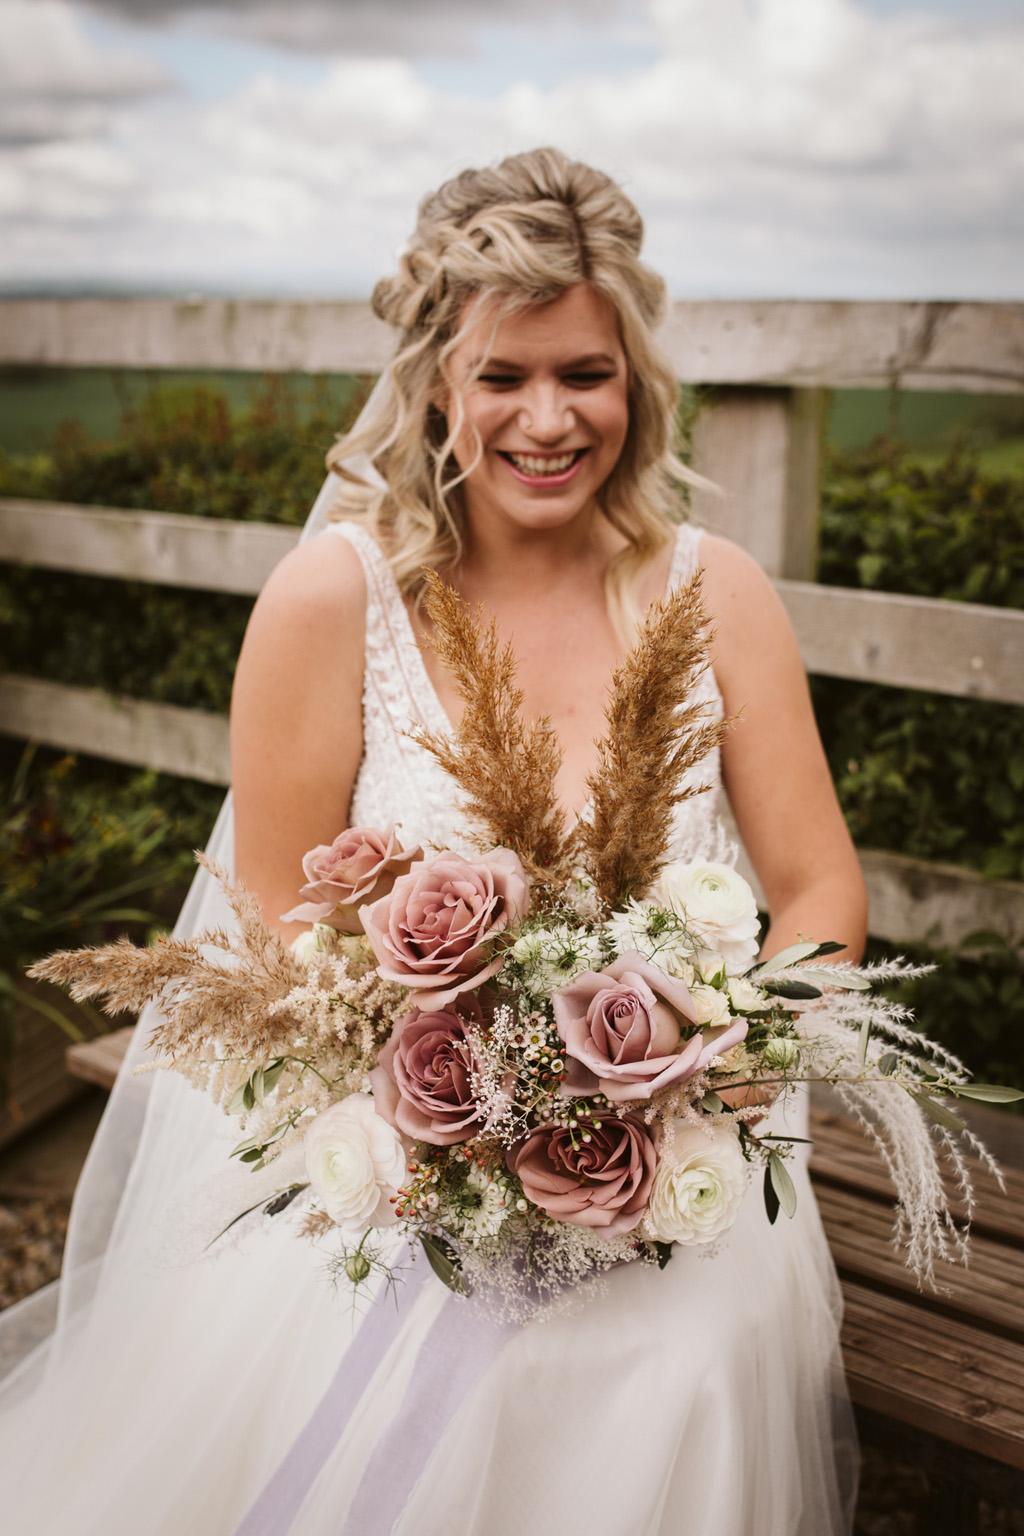 Yorkshire wedding and bridal prep photography by Hannah Brooke